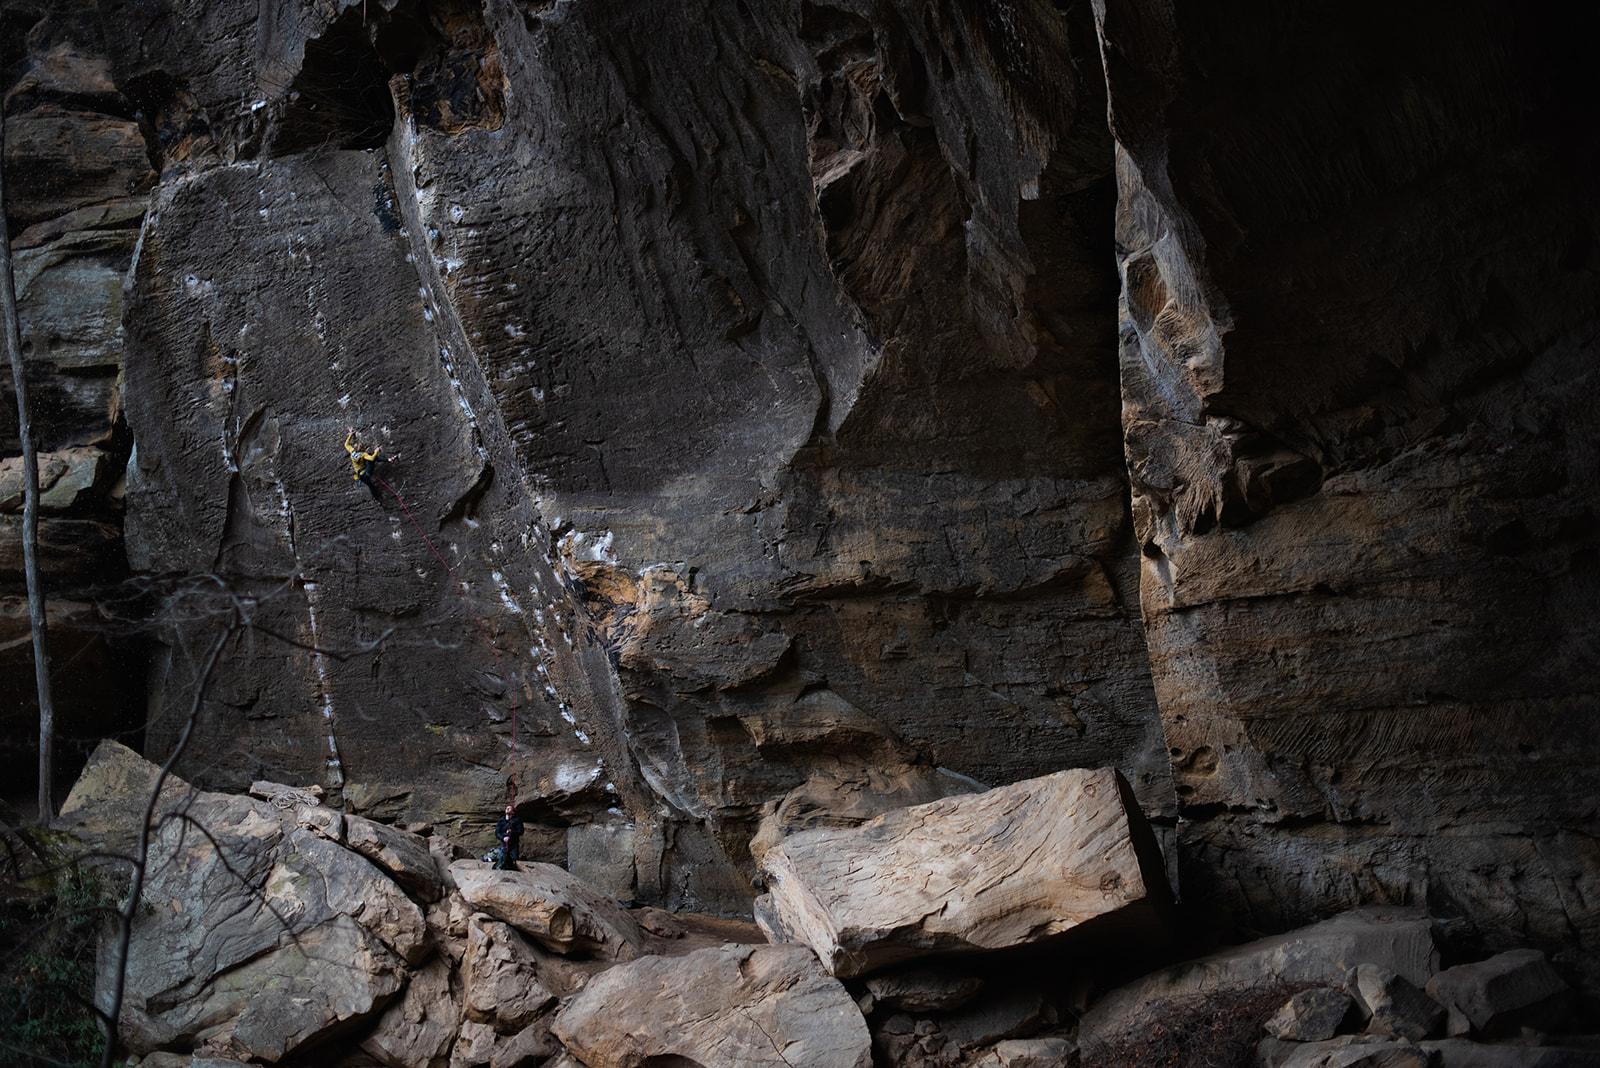 Climbing on Lucifer 5.14c in Kentucky